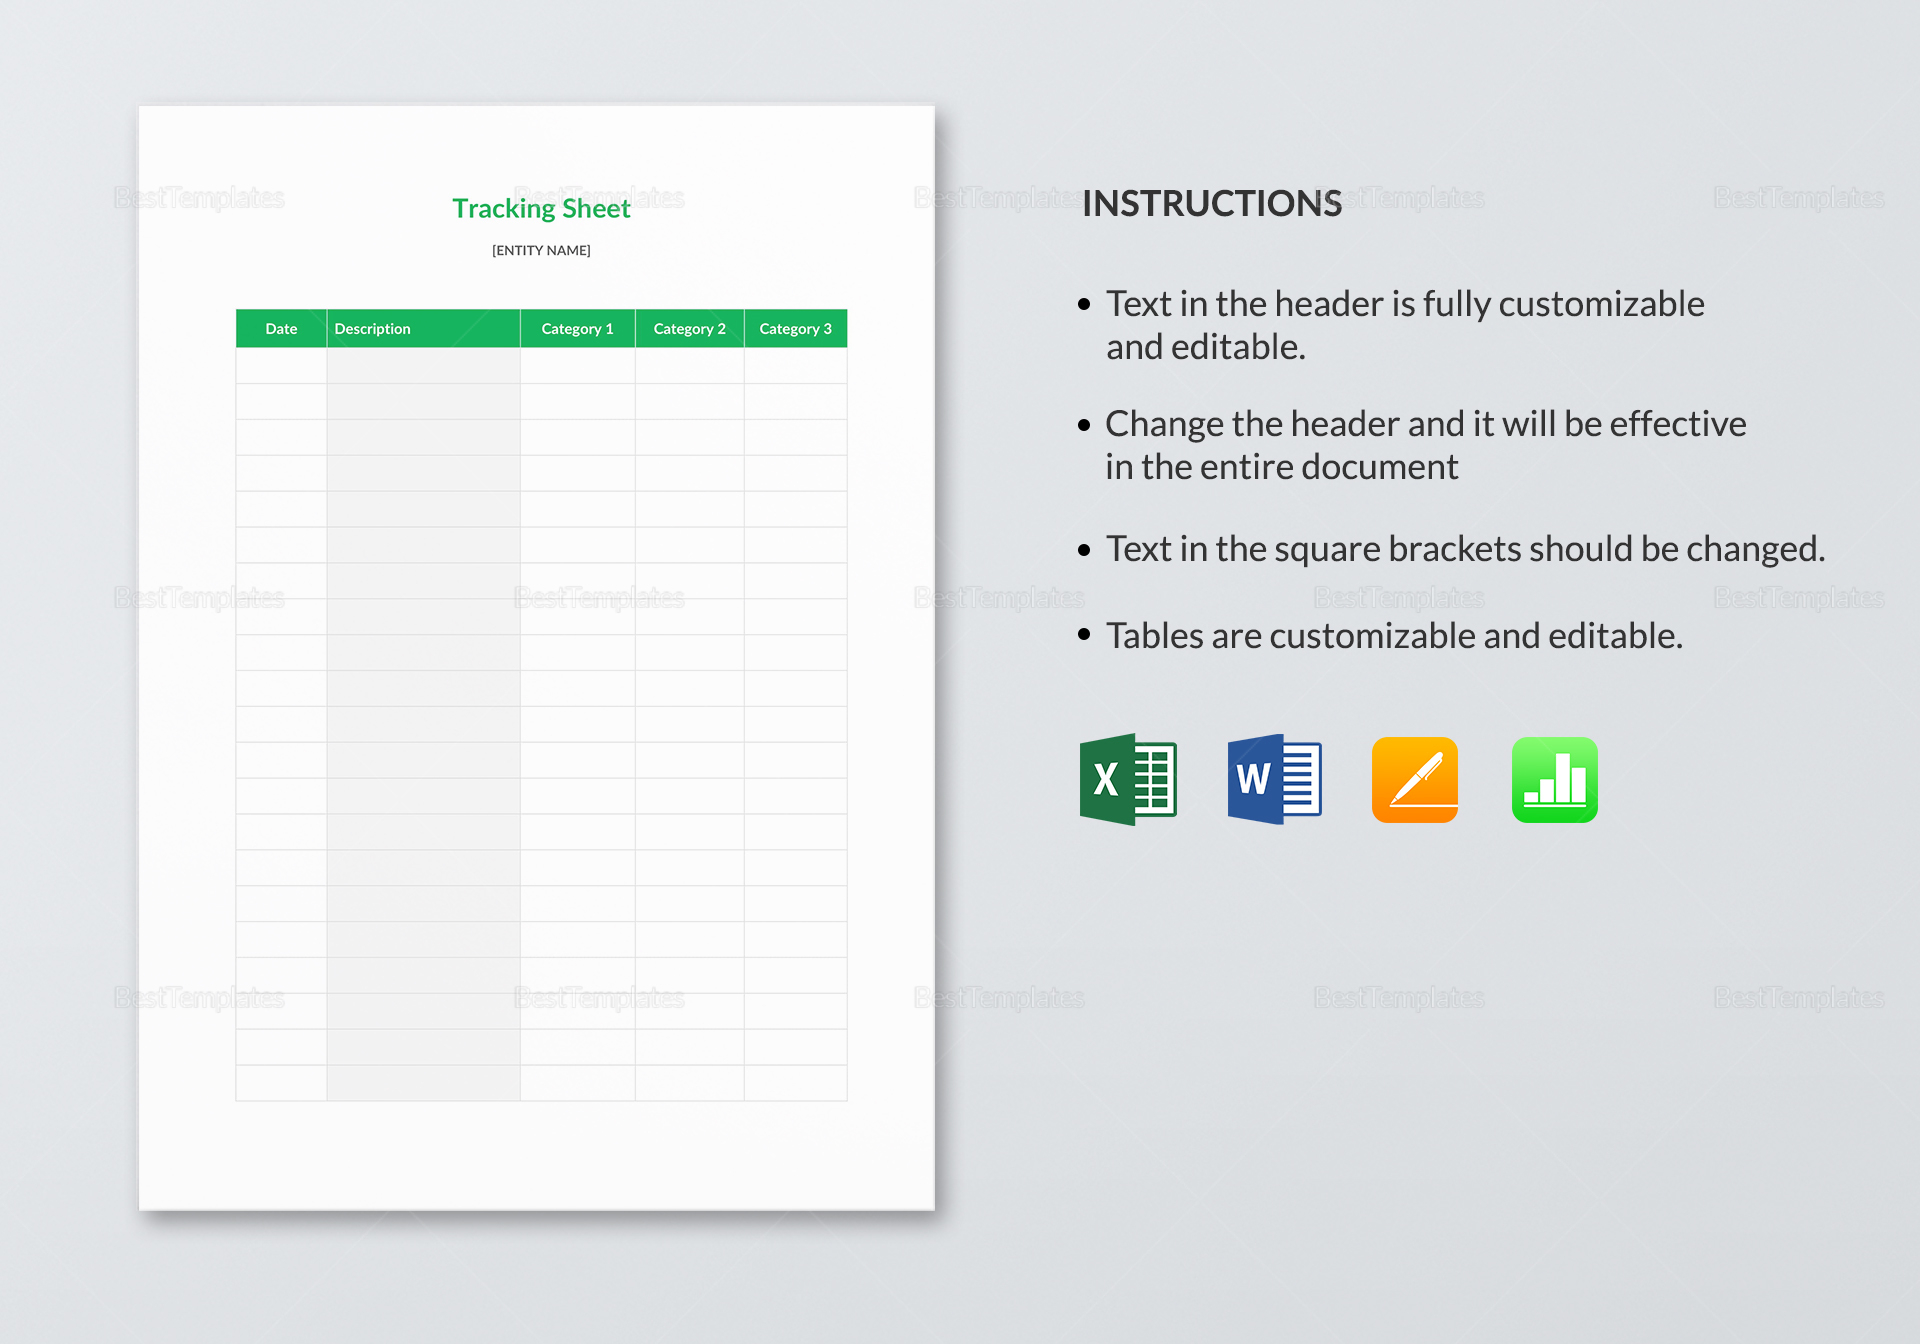 Sample Tracking Sheet Template